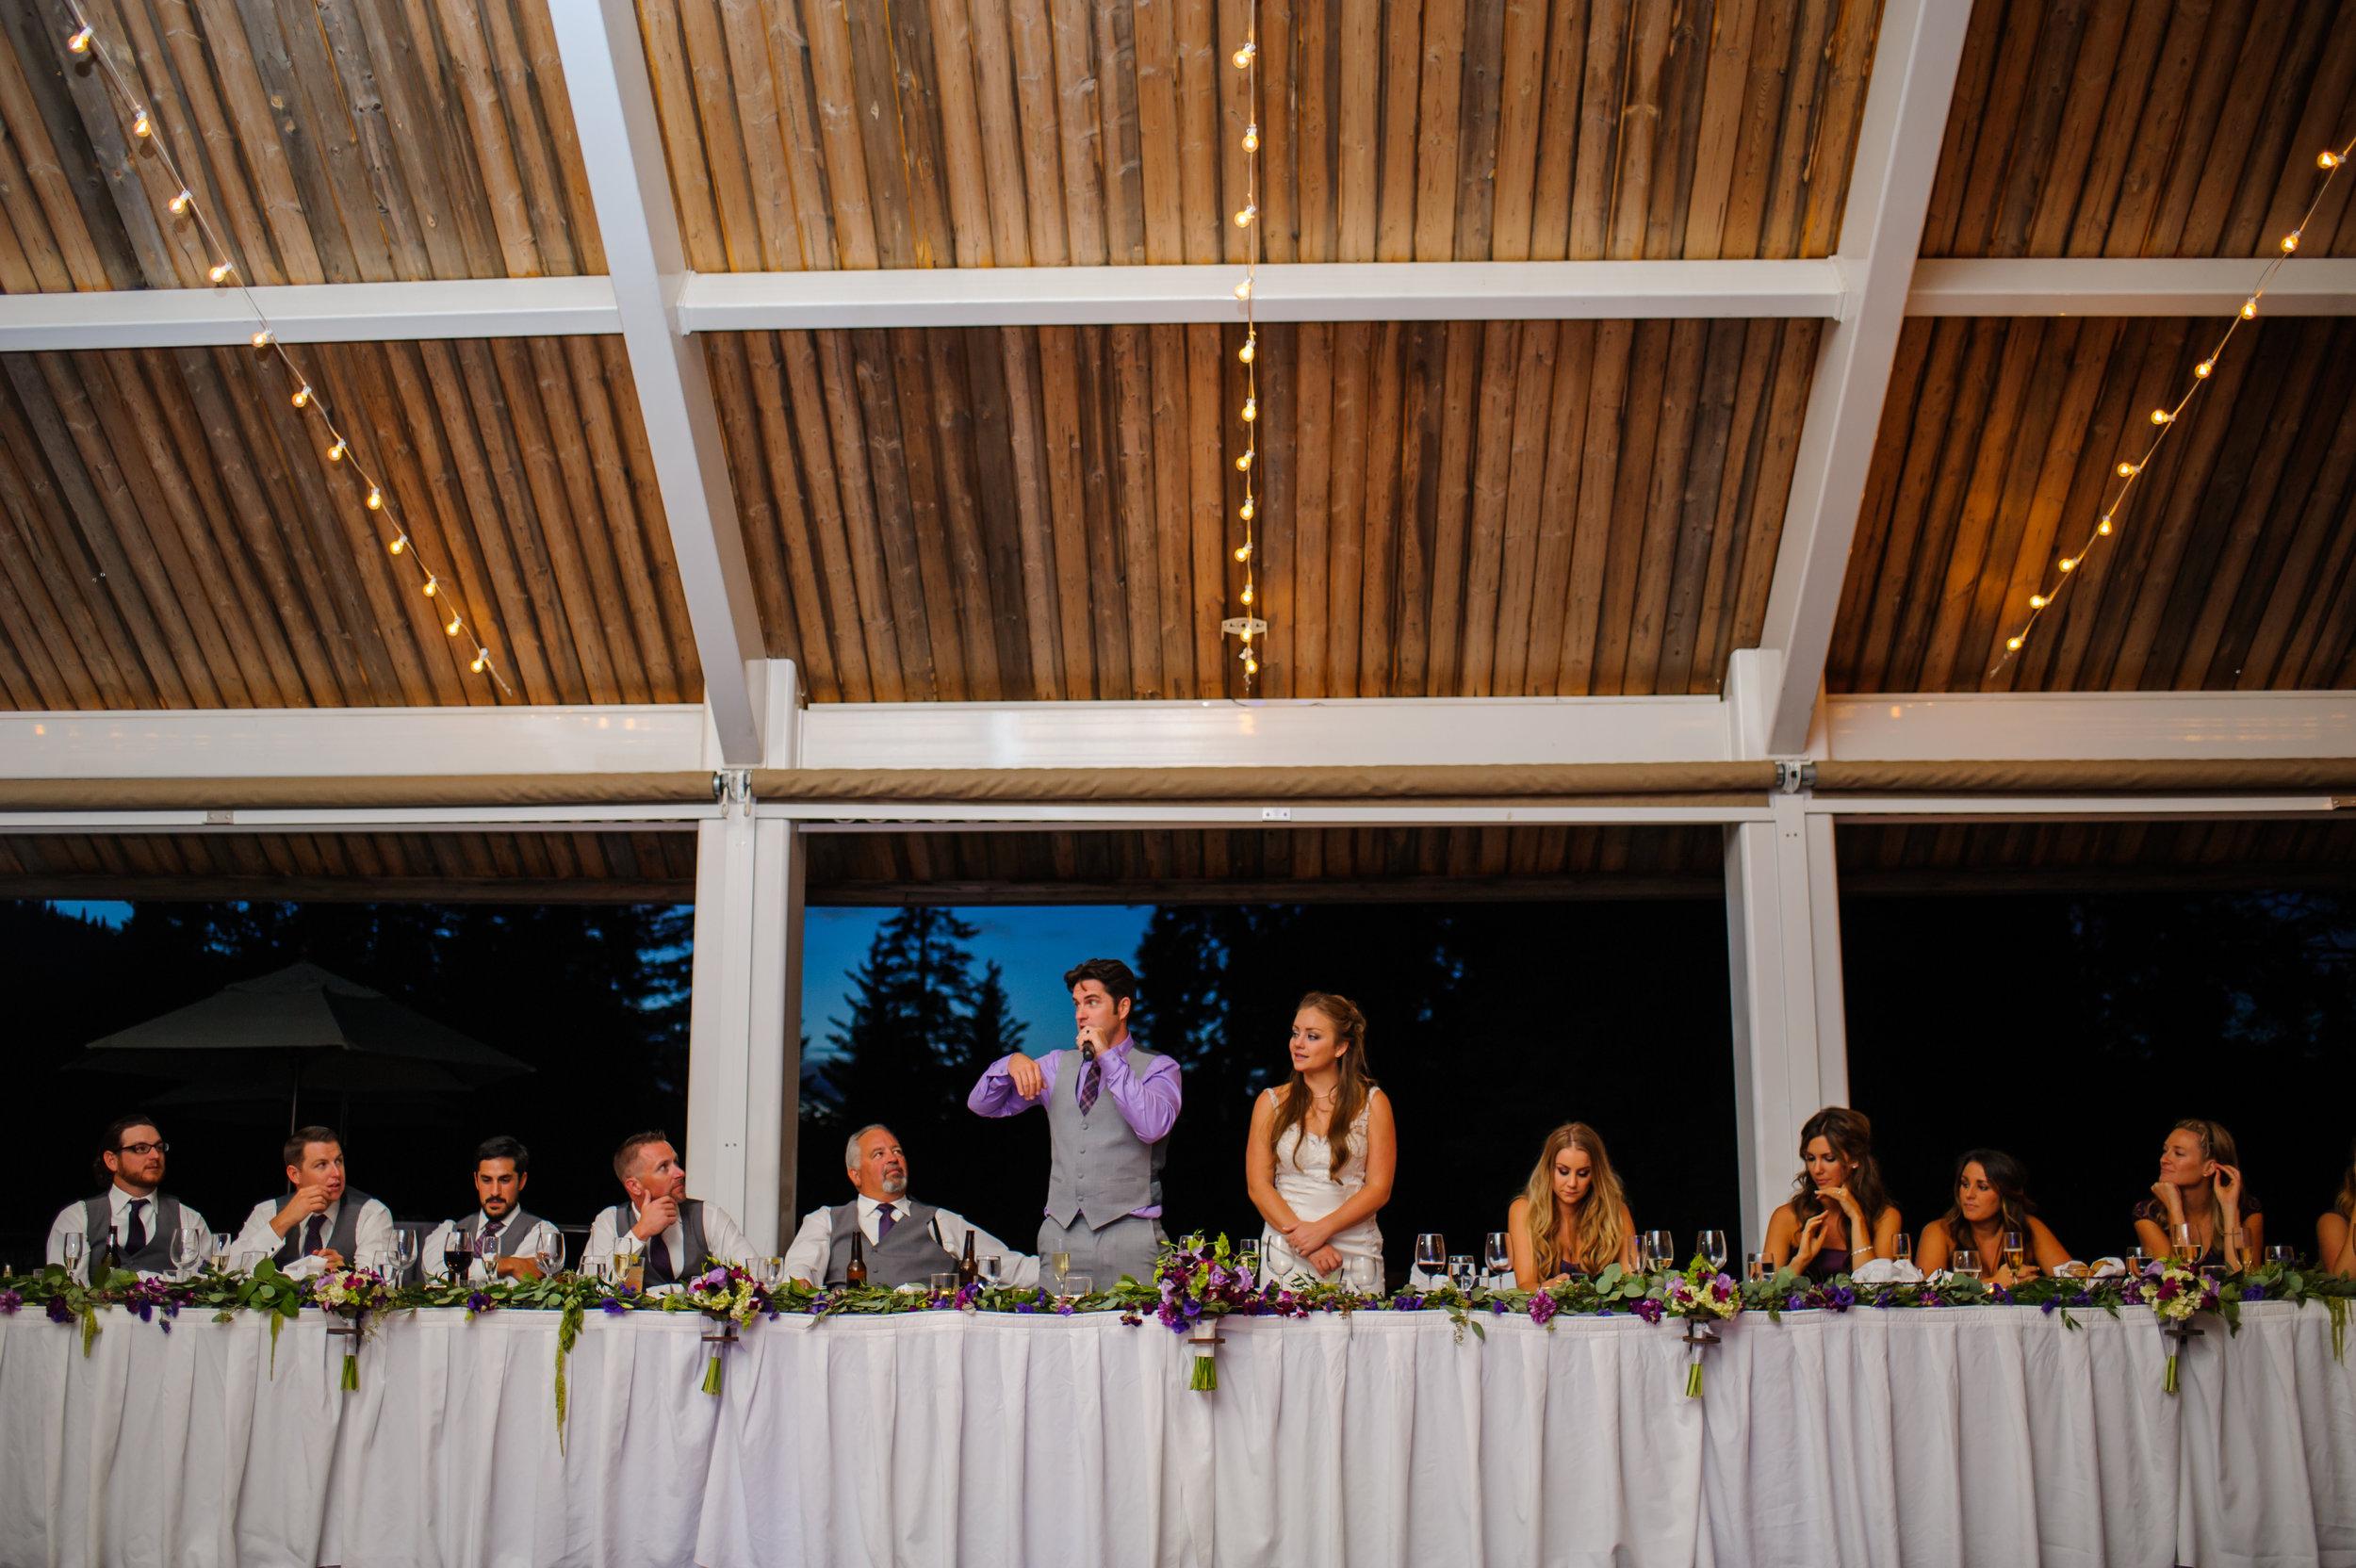 becca-jacob-037-tenaya-lodge-yosemite-wedding-photographer-katherine-nicole-photography.JPG